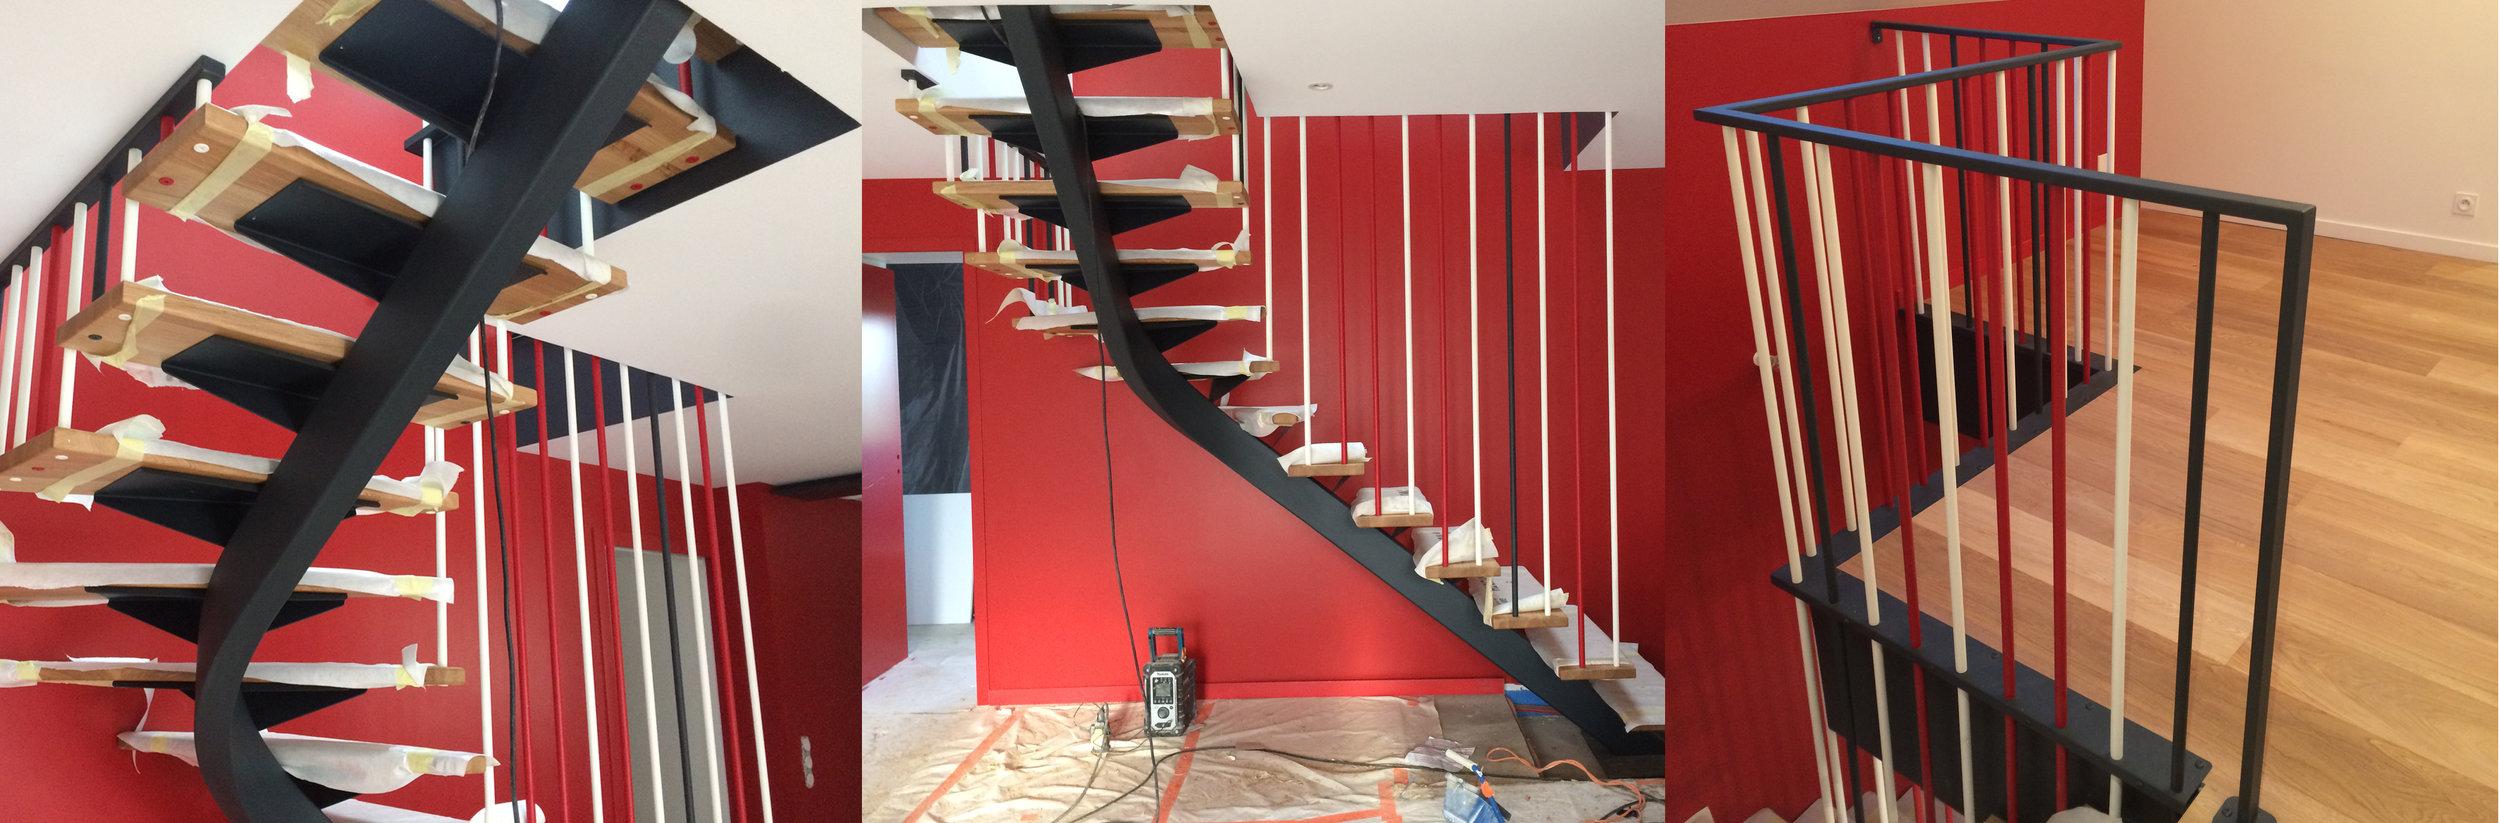 escalier cha copie.jpg